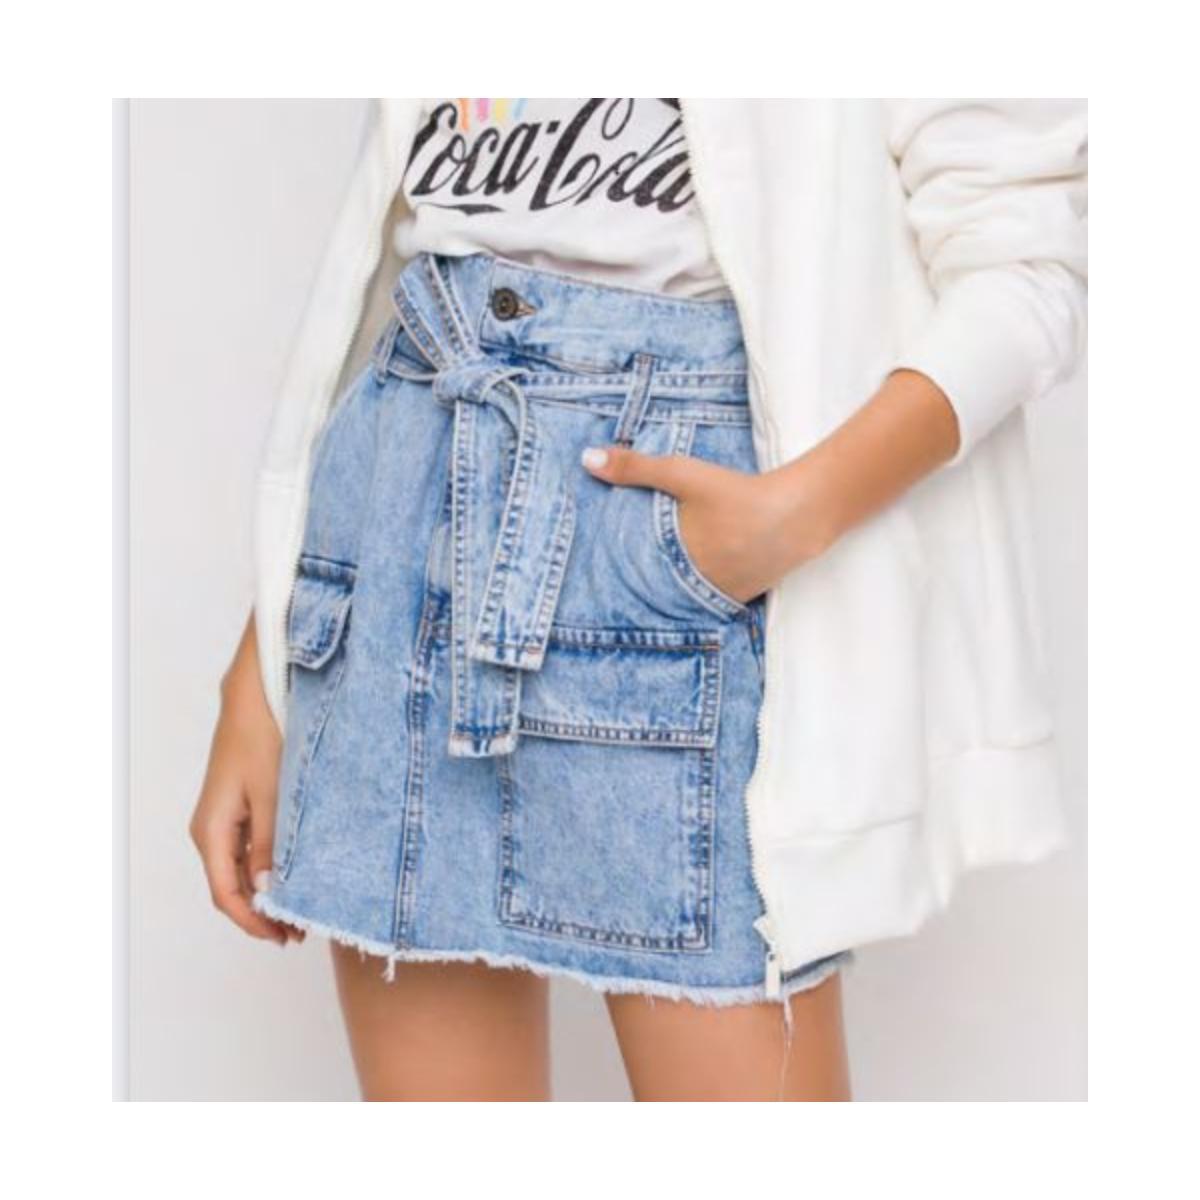 Saia Feminina Coca-cola Clothing 83201080 600 Jeans